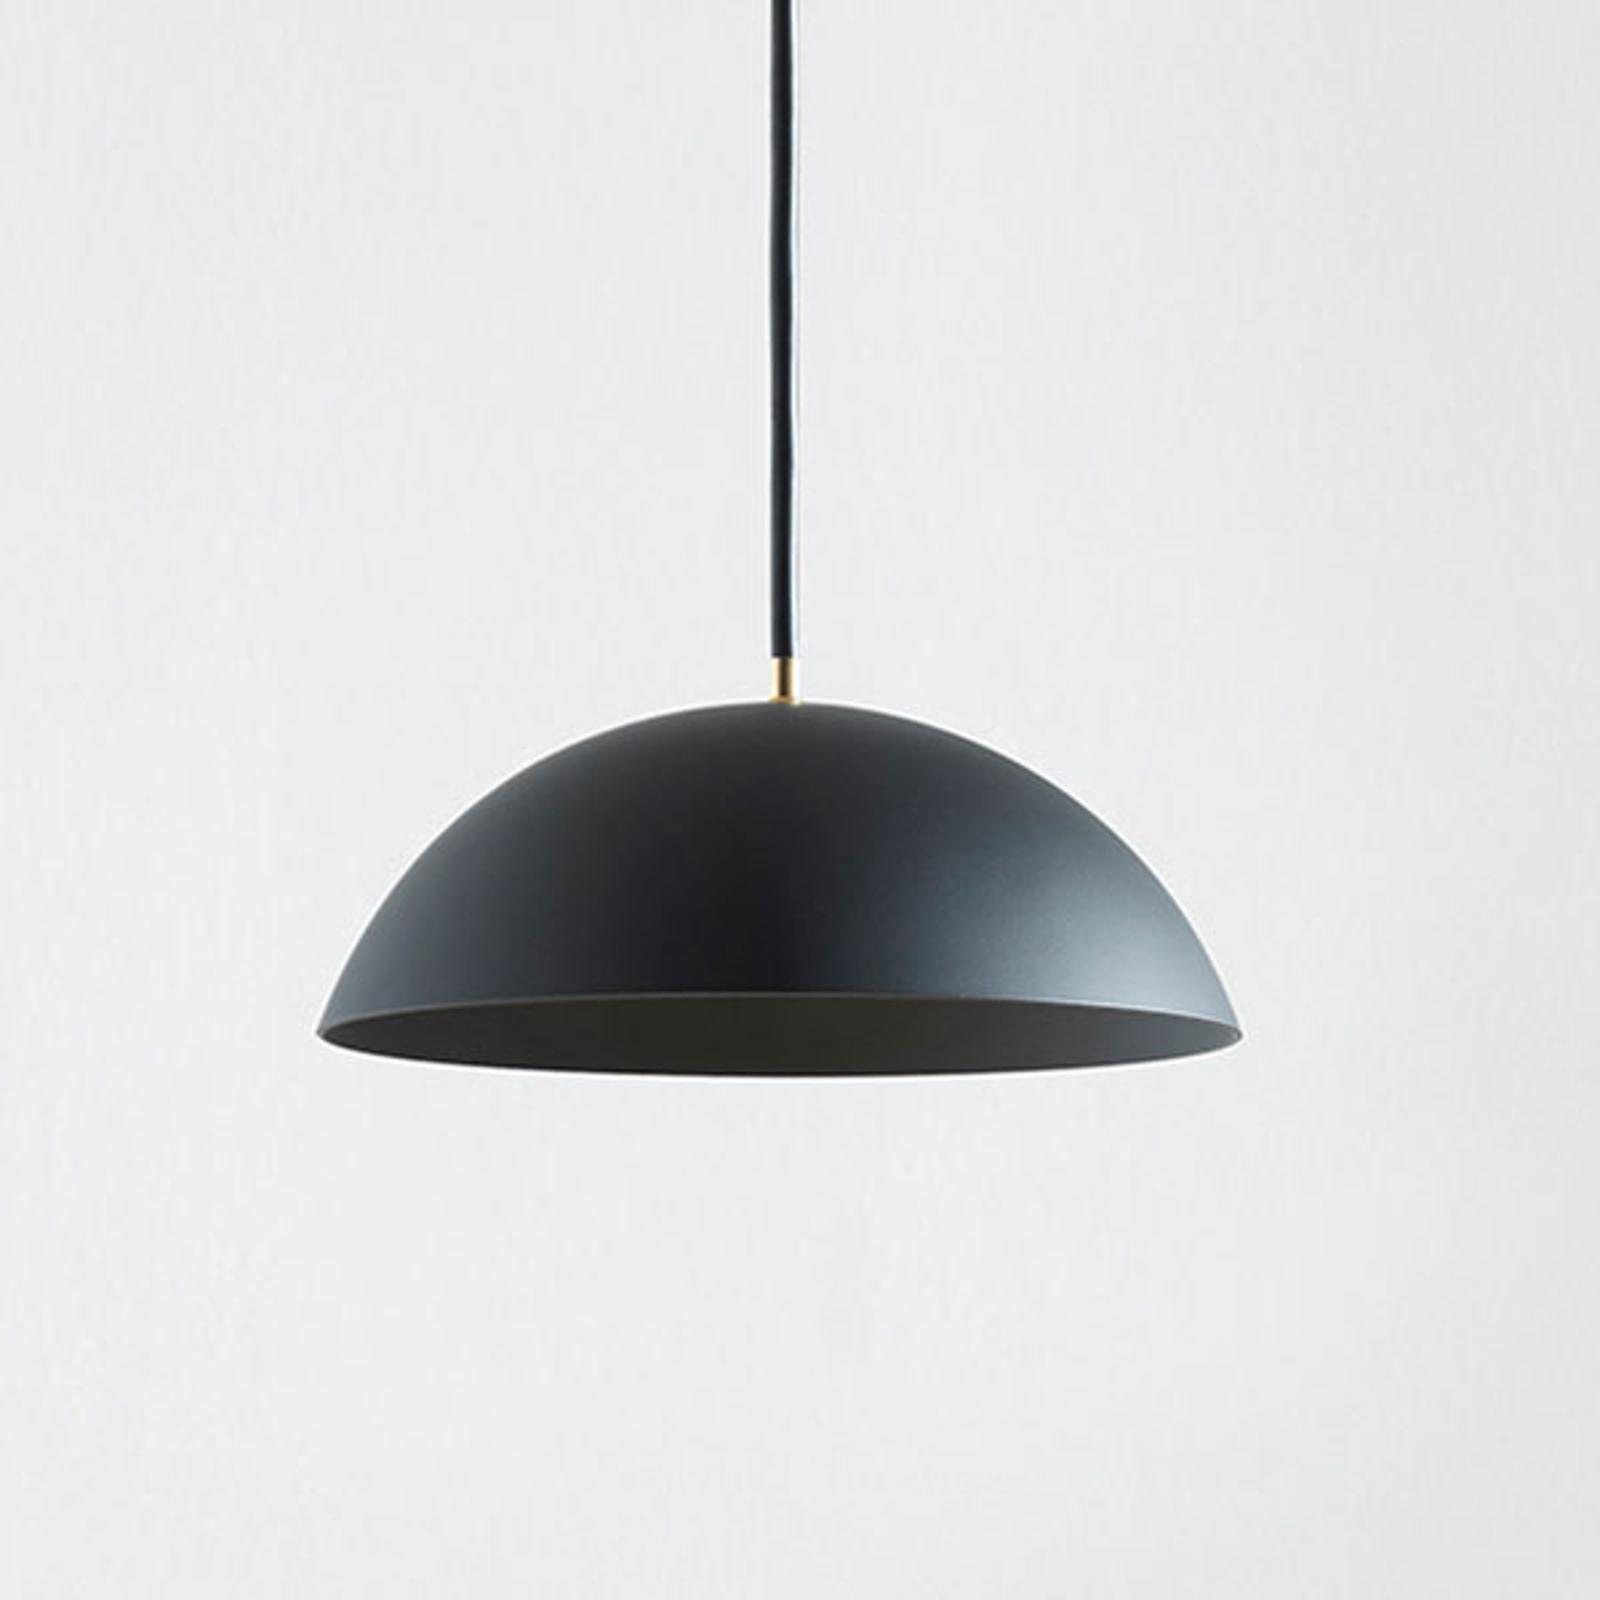 Nyta Pong Ceiling lampa wisząca LED, kabel 3m